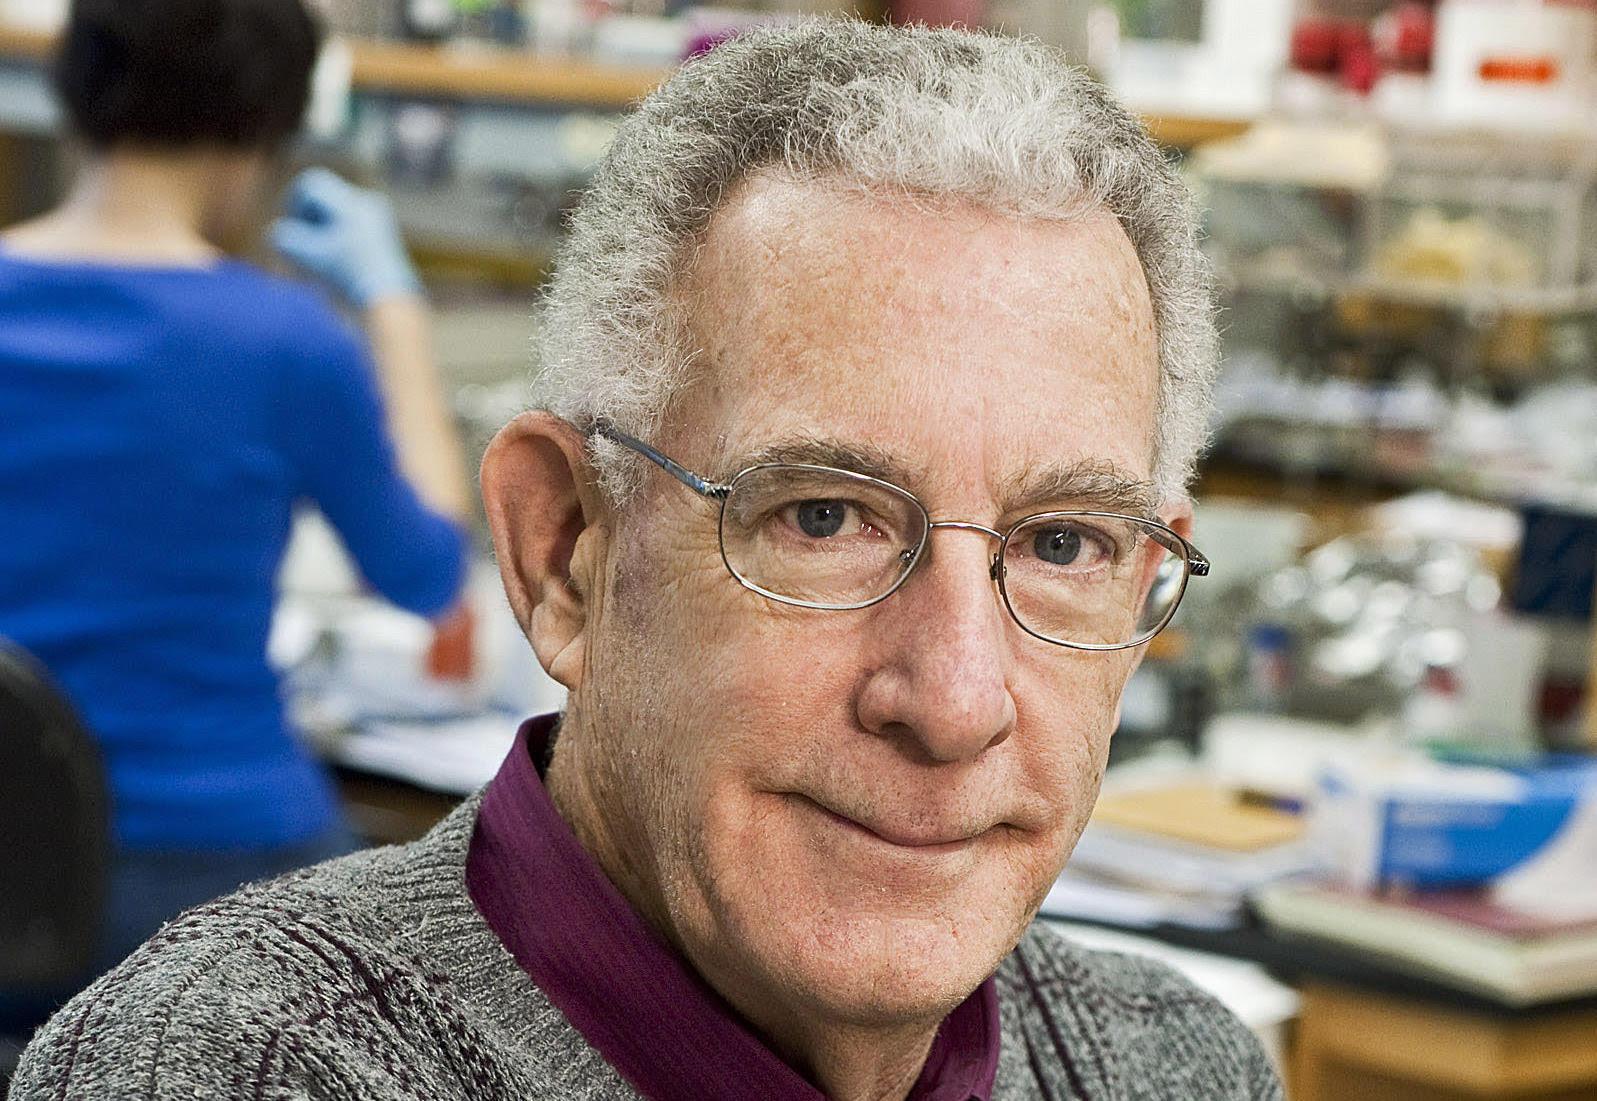 Thomas Seyfried, PhD, Professor, Department of Biology, Boston College